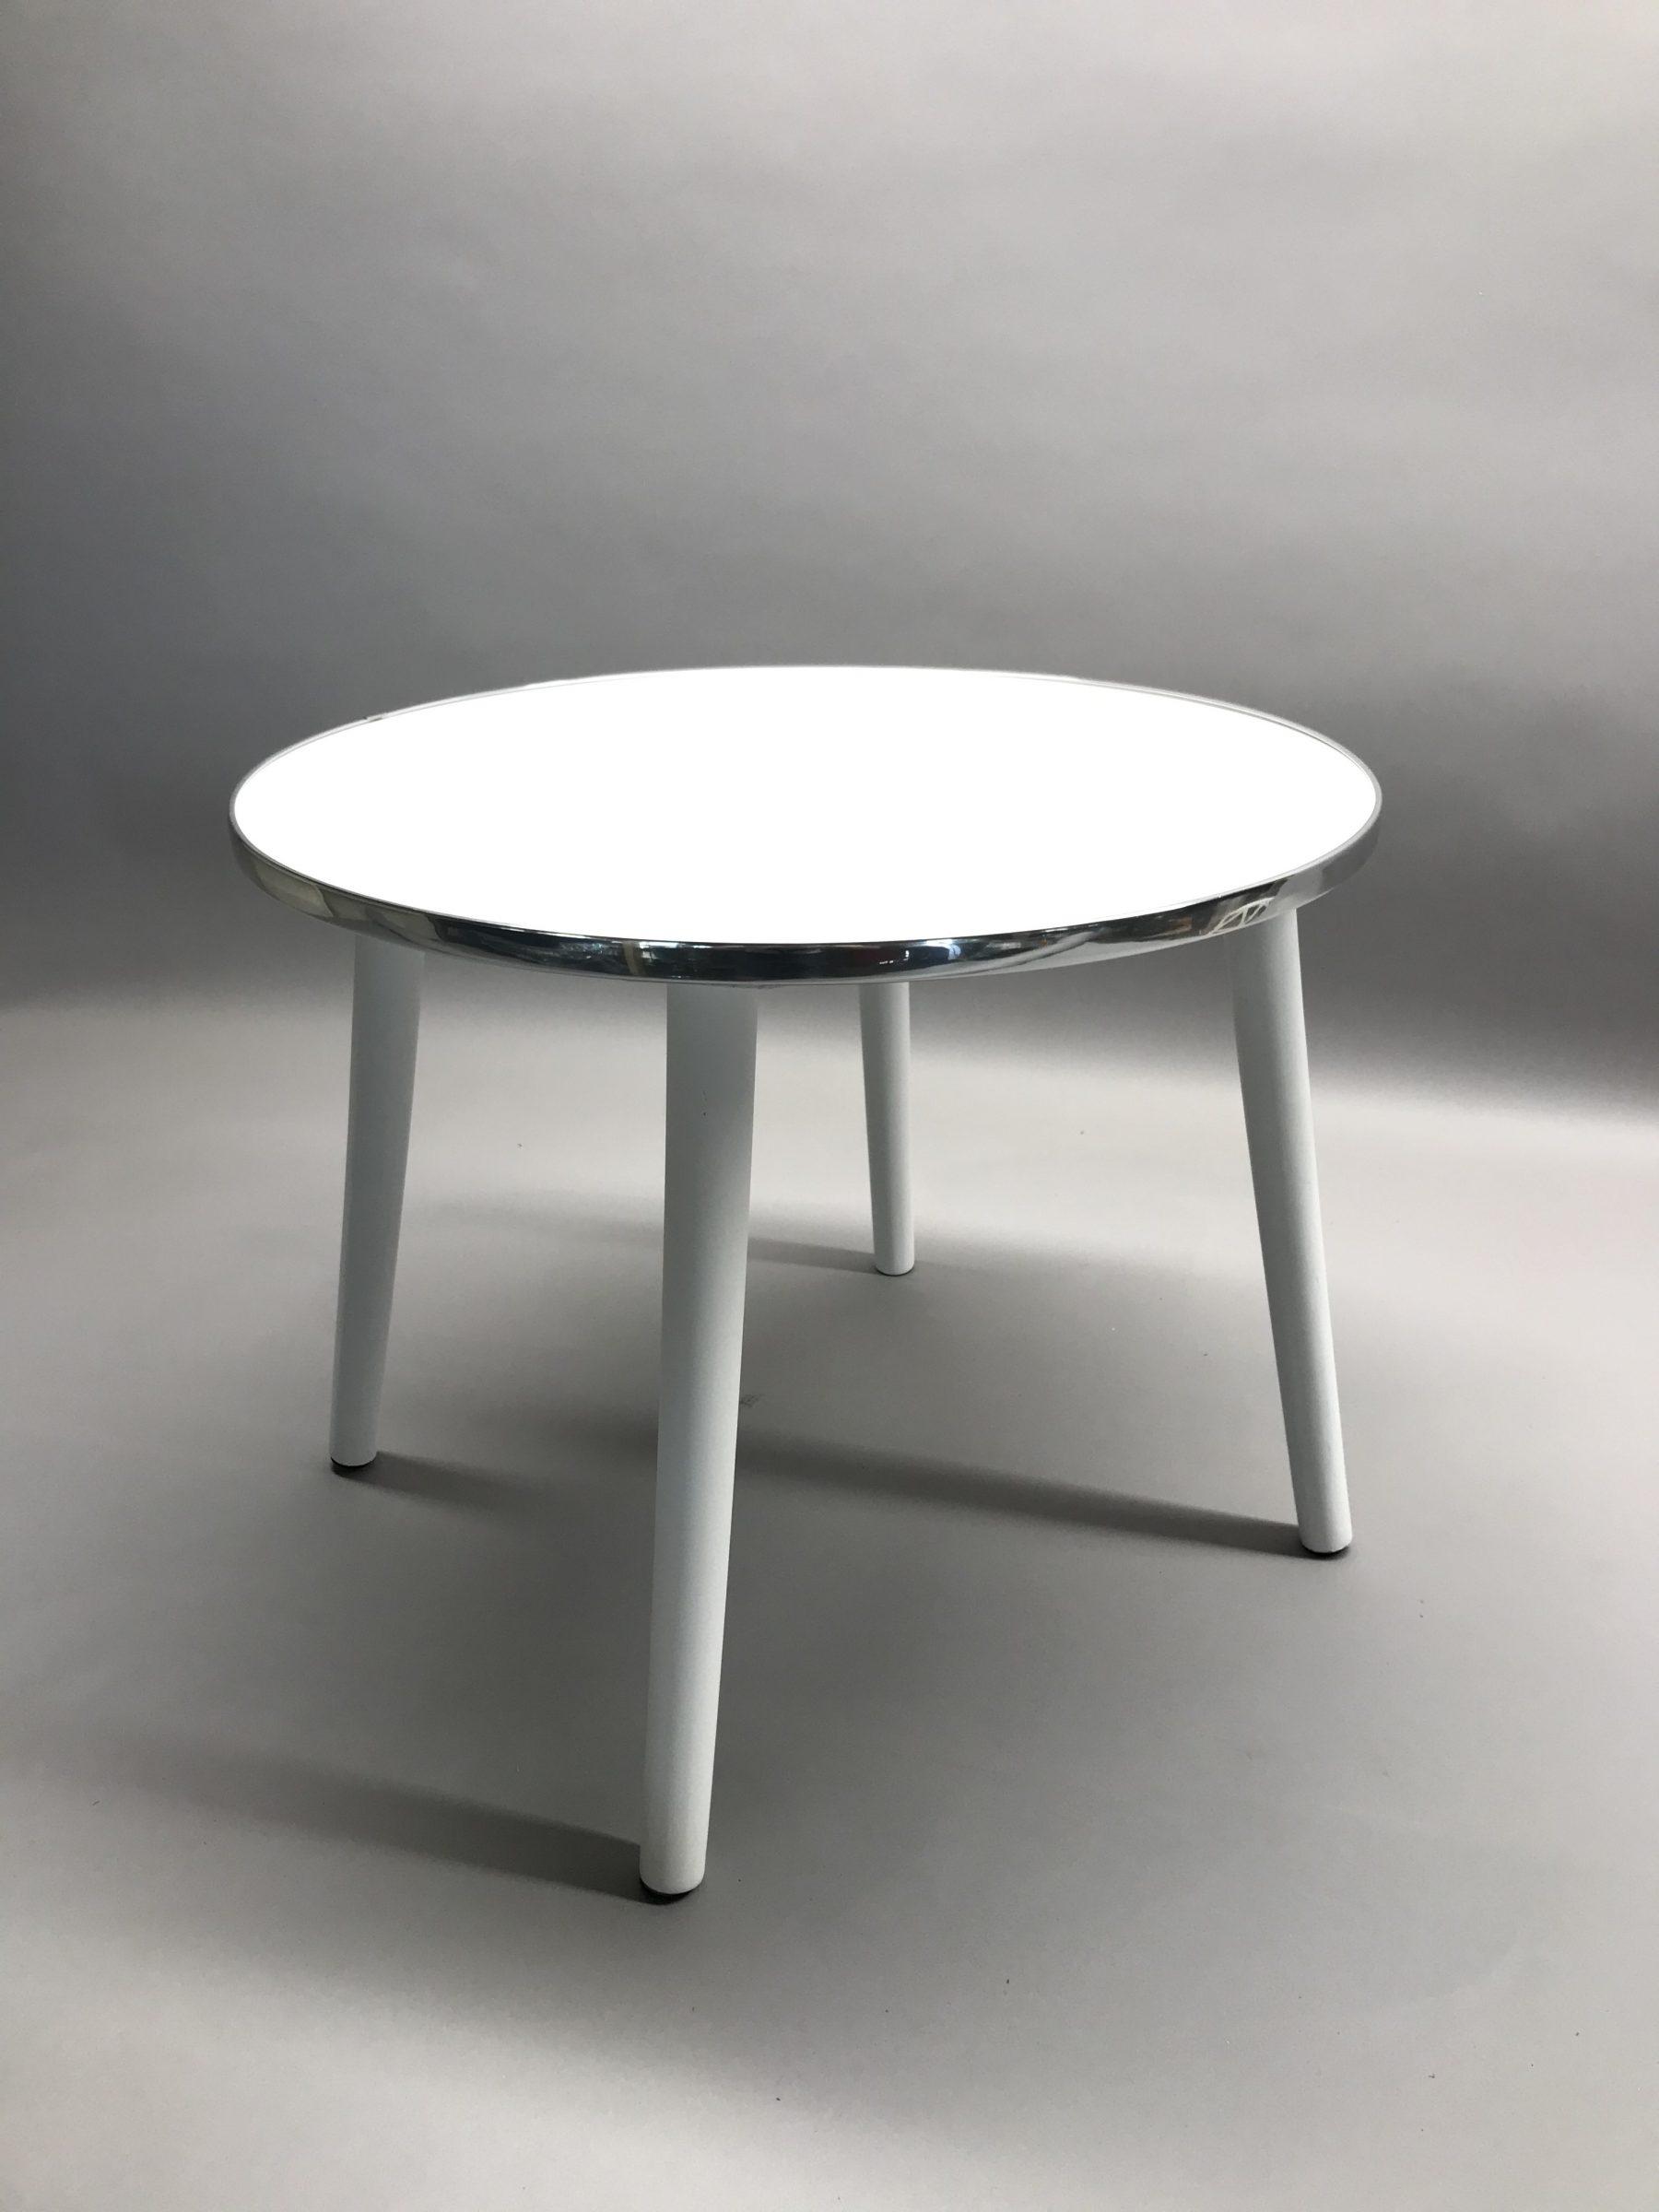 Balts galdiņš White table Белый стол